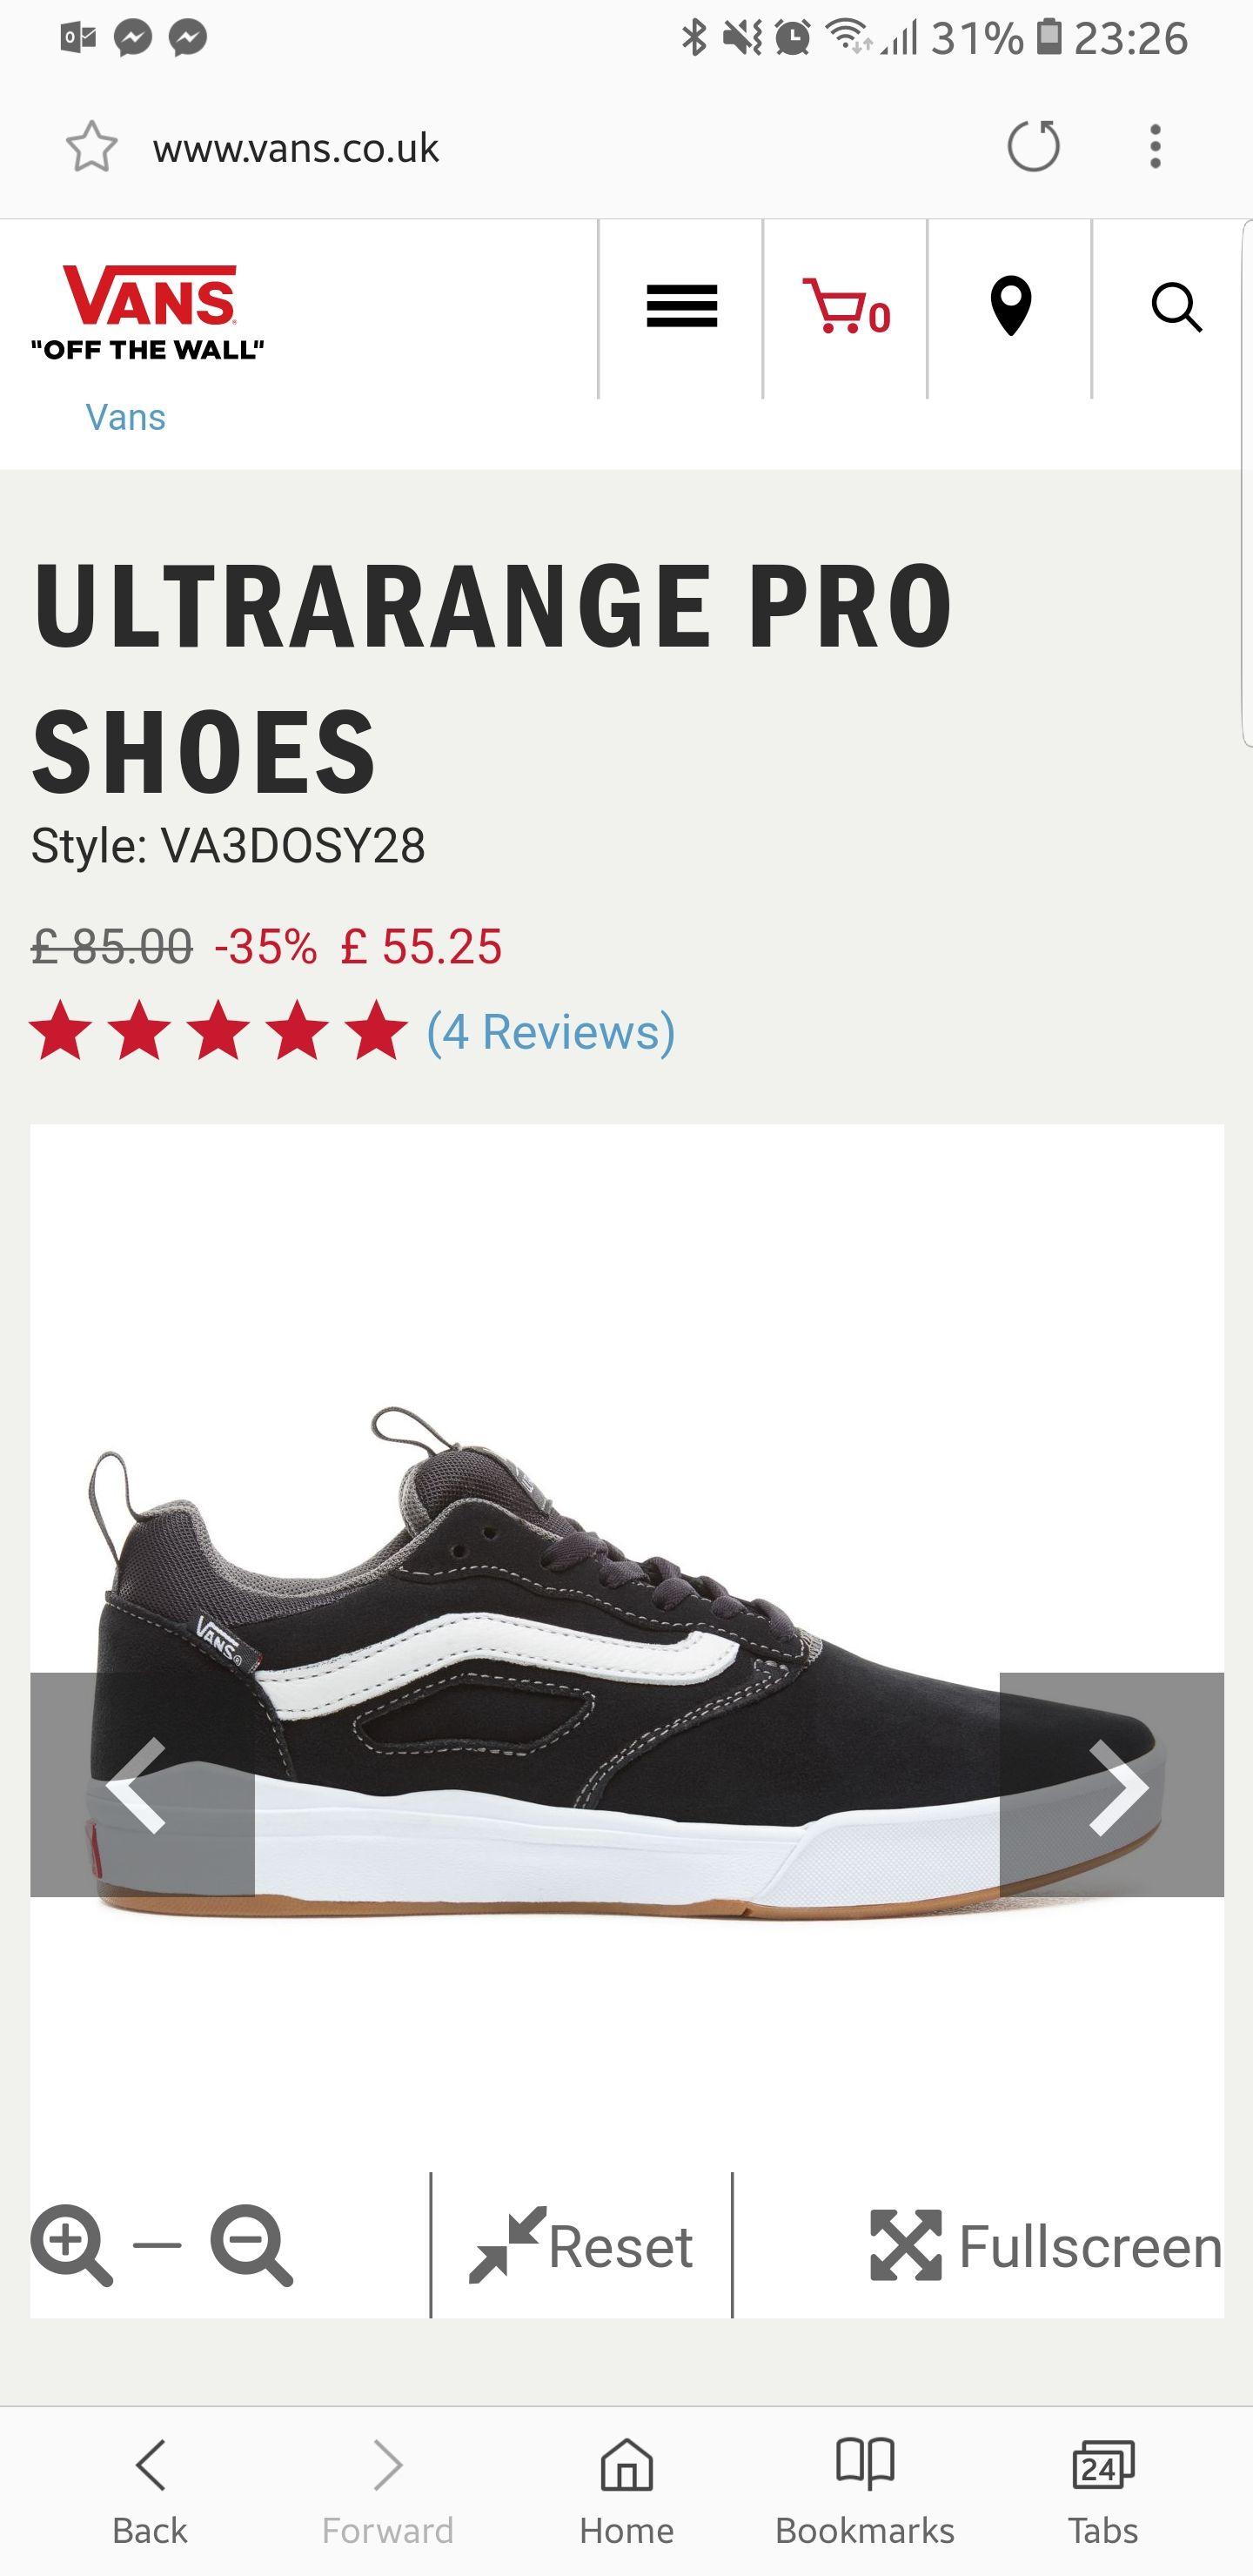 Van's ultrarange Pro Black and White trainers - £49.72 with code @ Vans